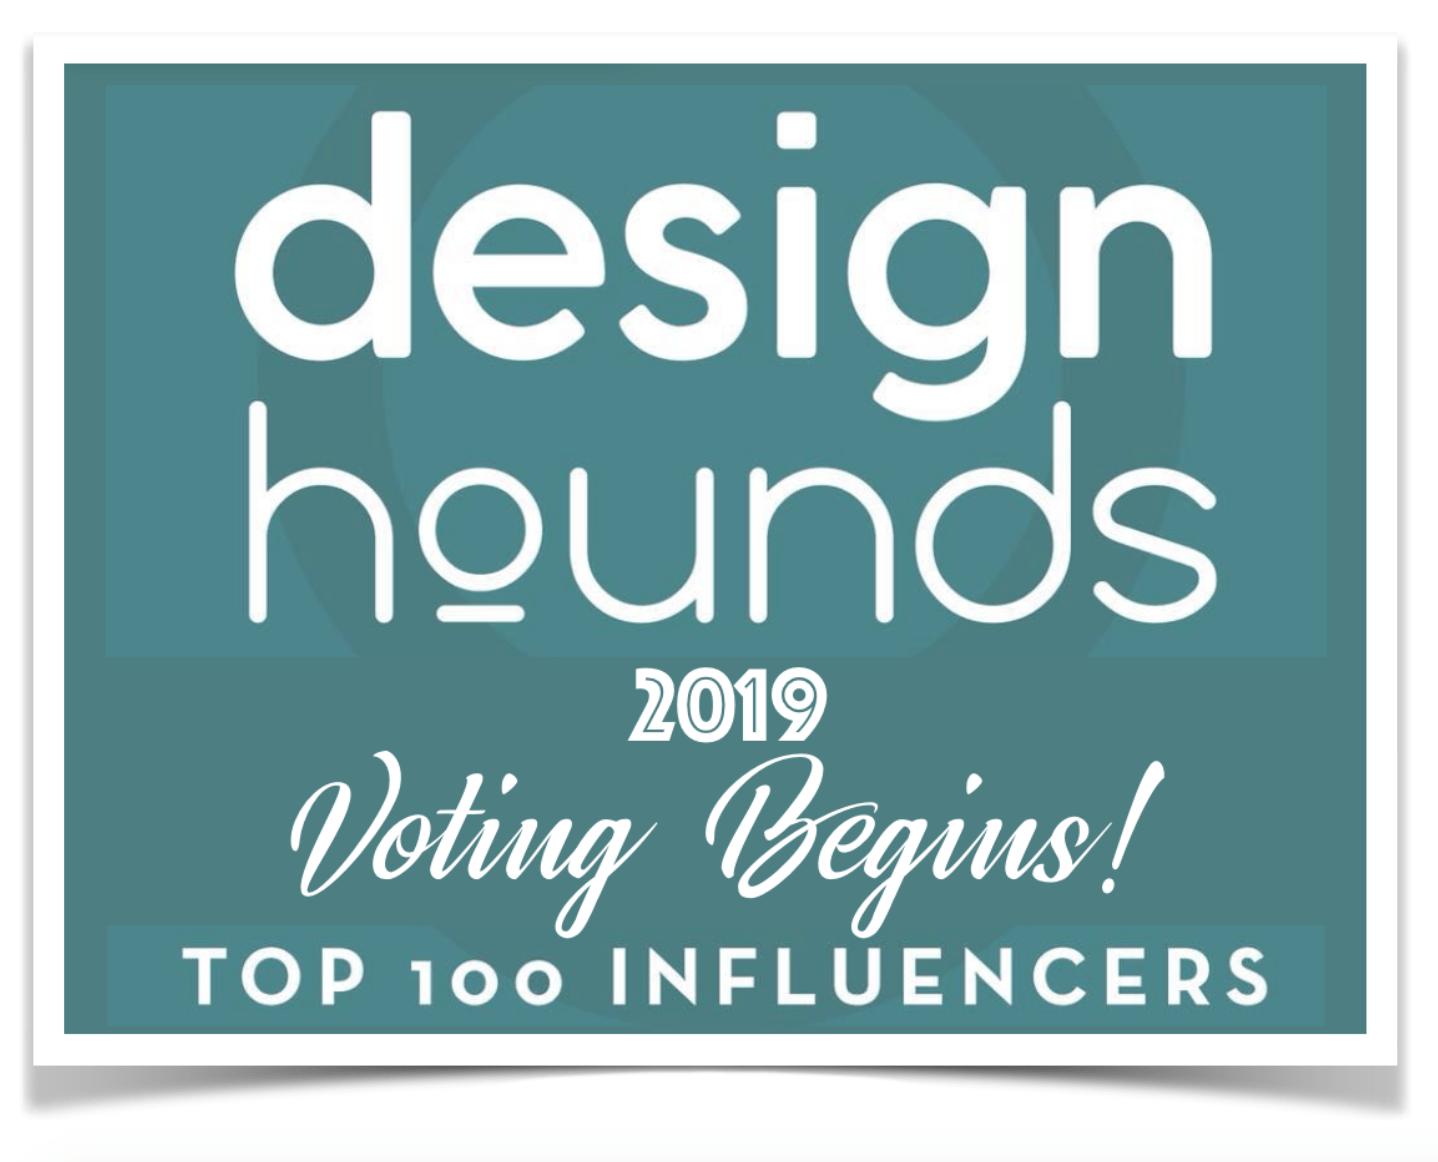 Design Hounds, Modenus, Christine Kohut Interiors, #designninja, Top 100 Influencers, Vote